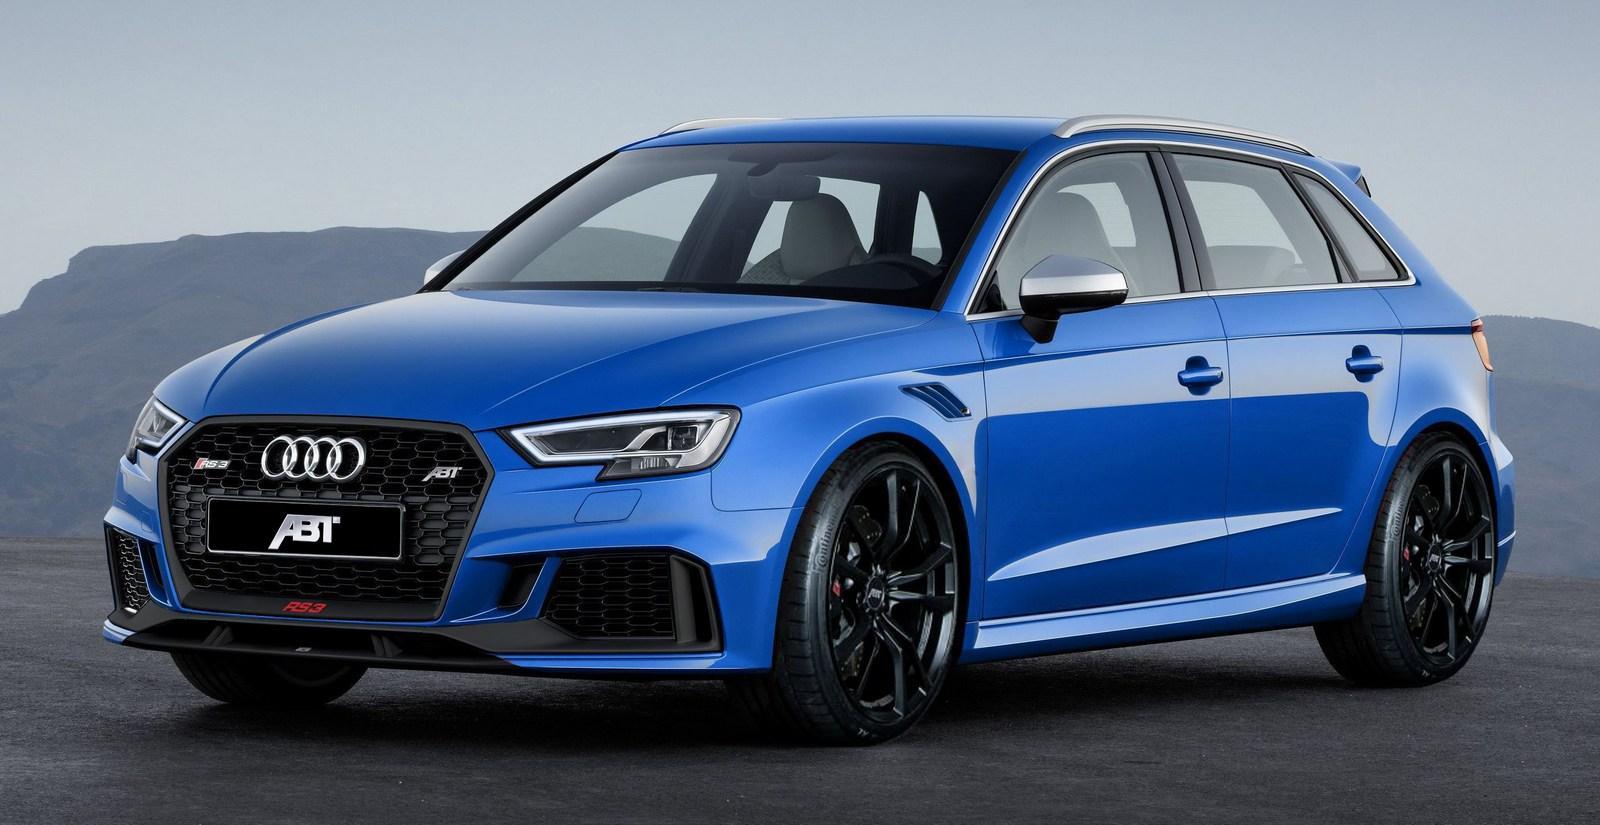 Audi RS3 Sedan si Sportback de la ABT - Audi RS3 Sedan si Sportback de la ABT